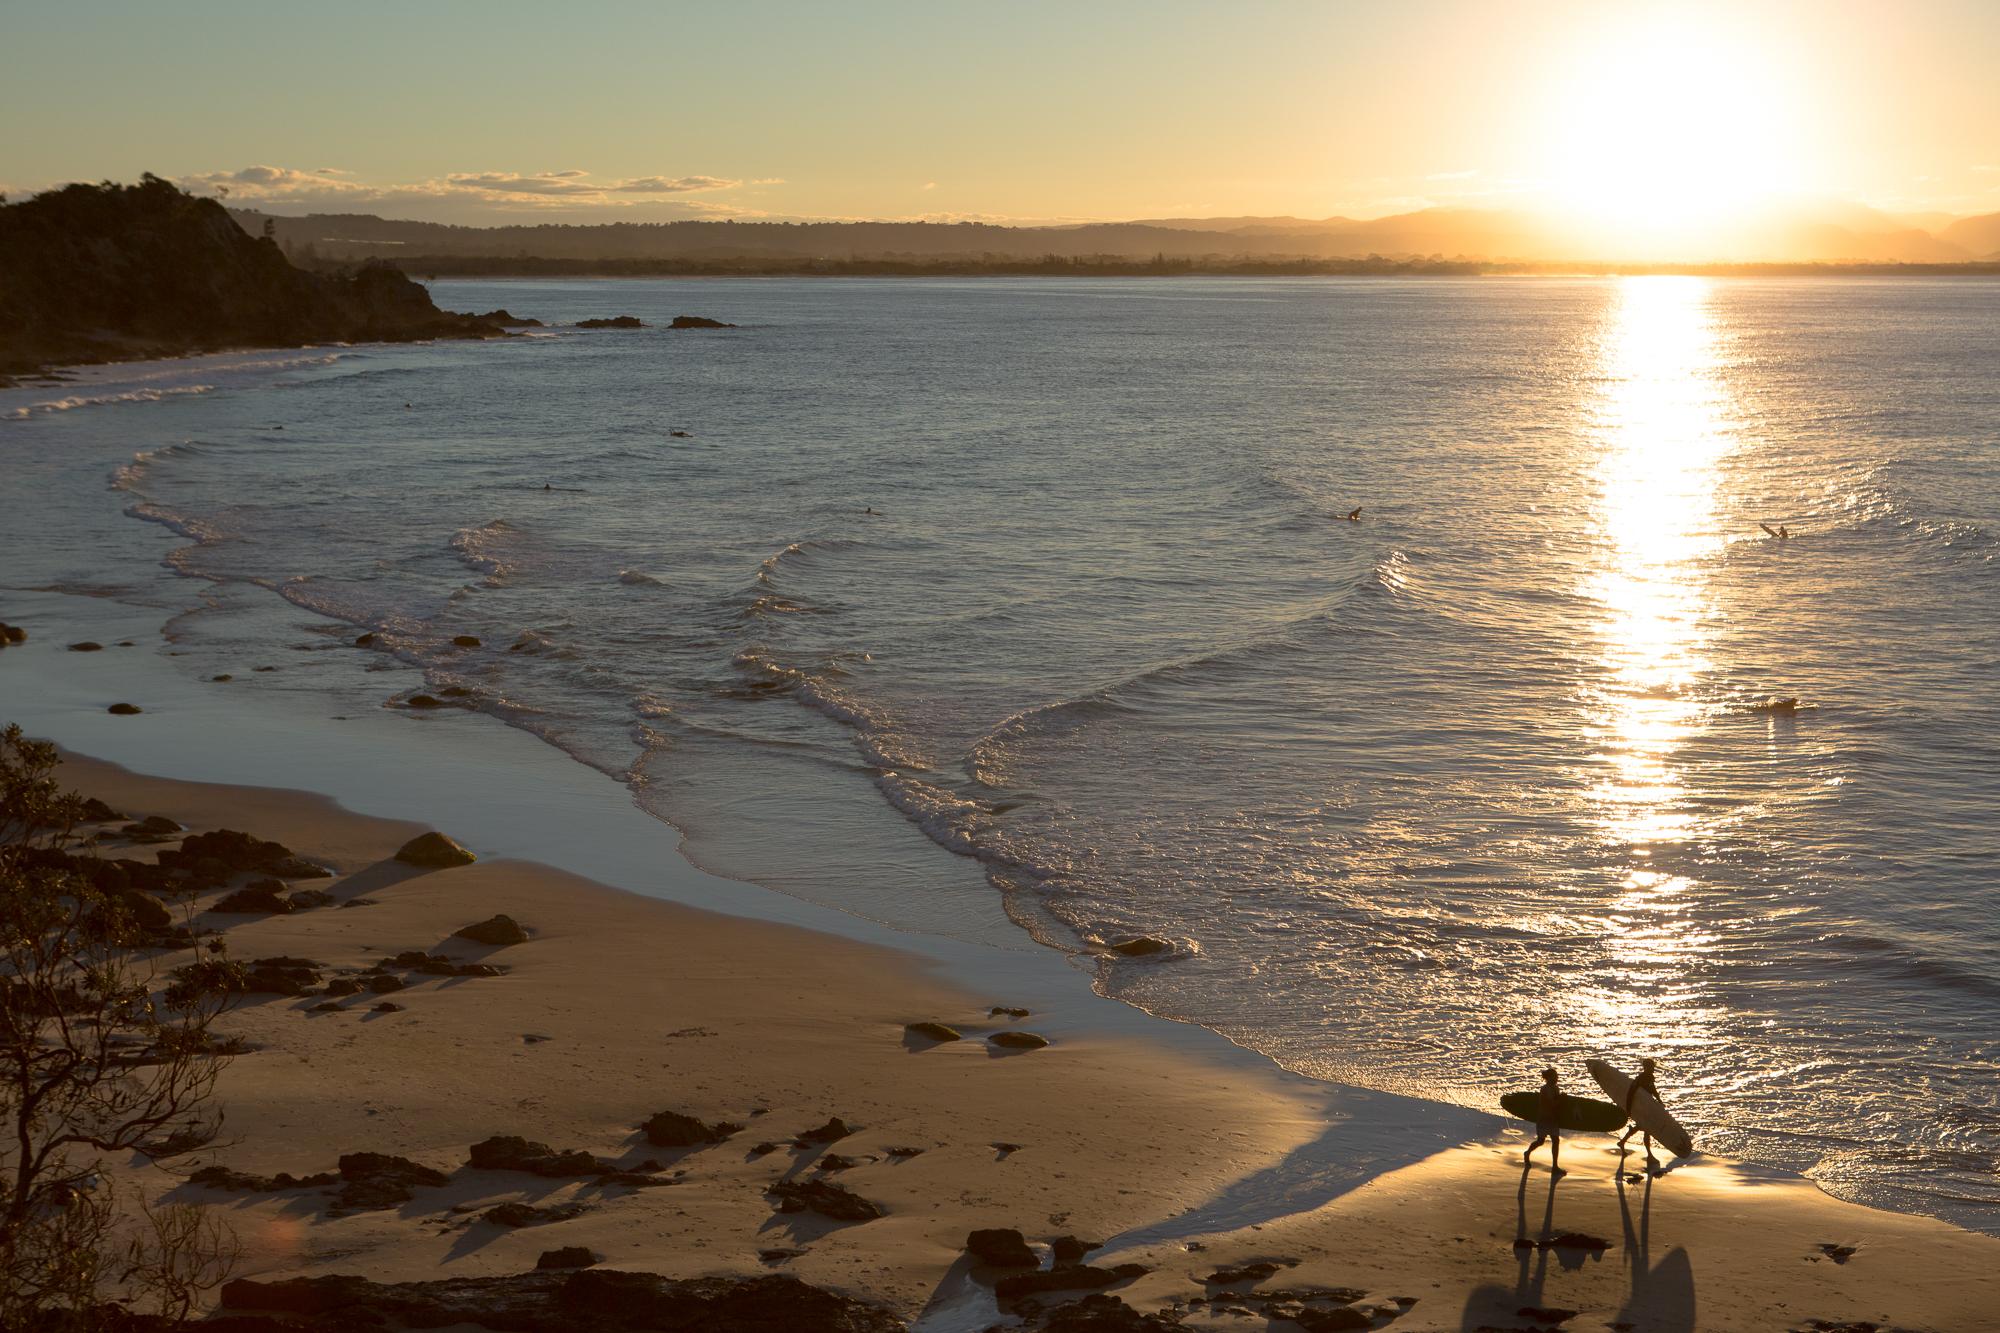 46-Bec_Kilpatrick_Photography_AustraliaBEC_9393